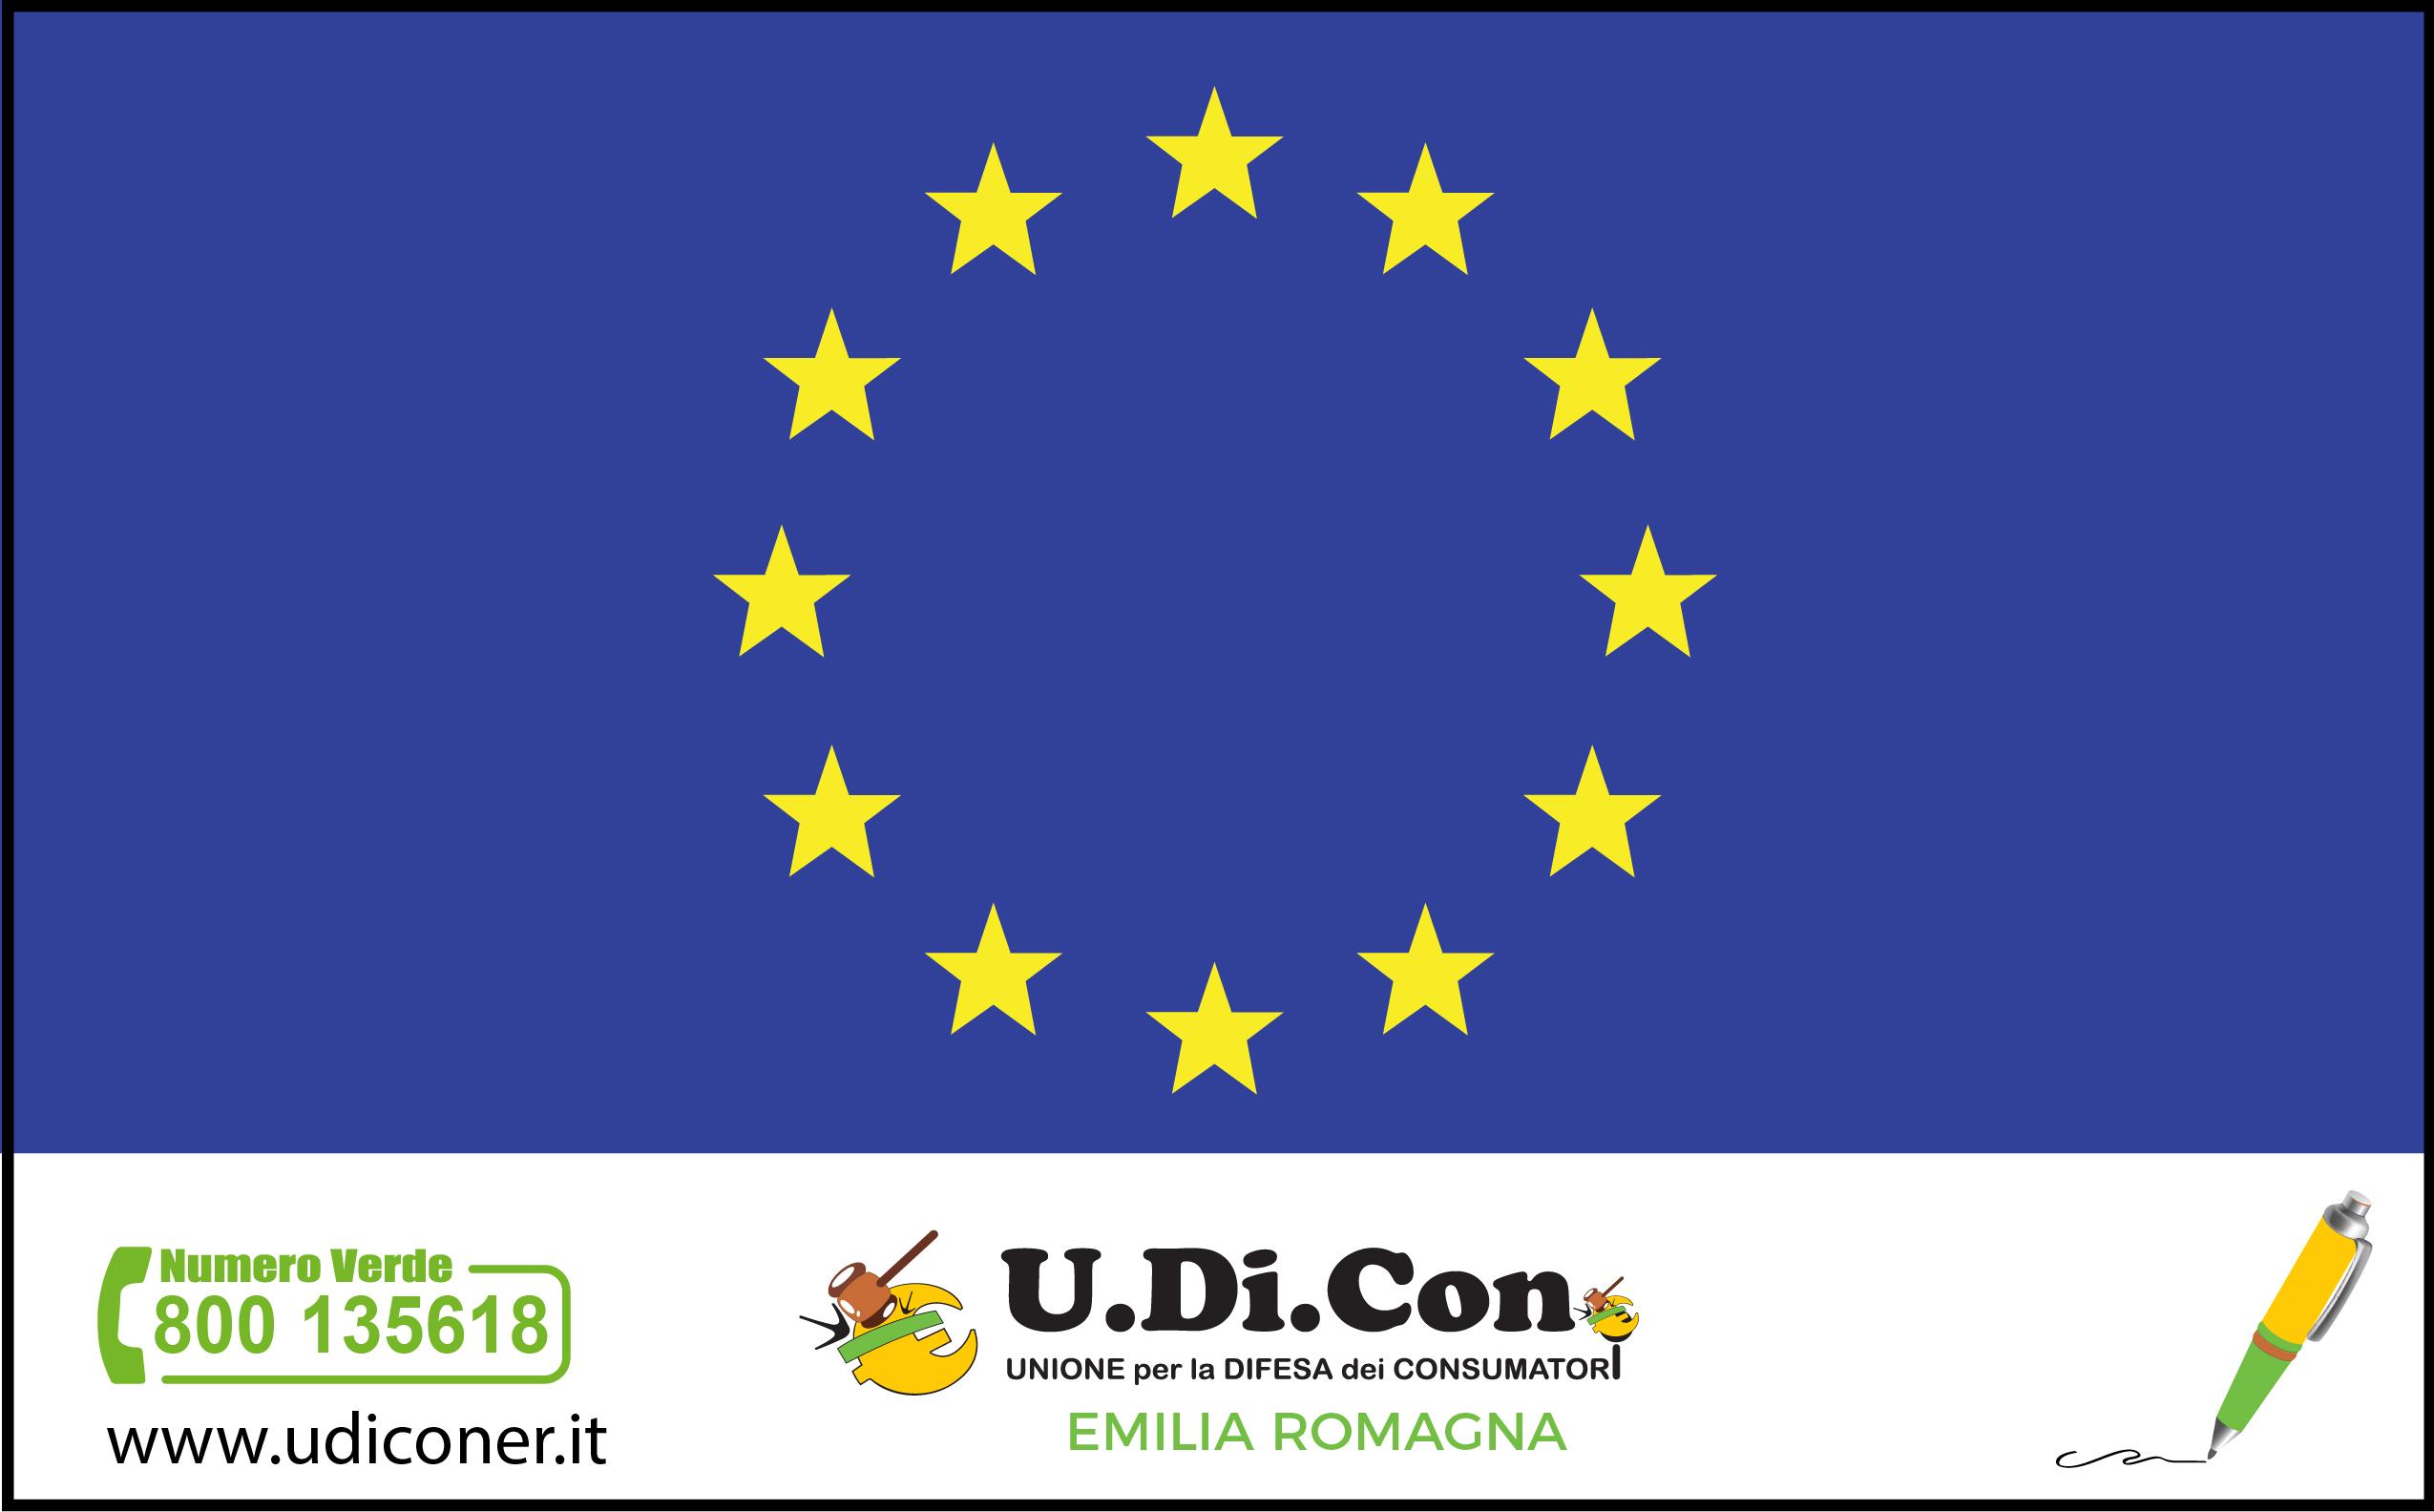 Energie rinnovabili: miglior cooperazione fra i paesi europei